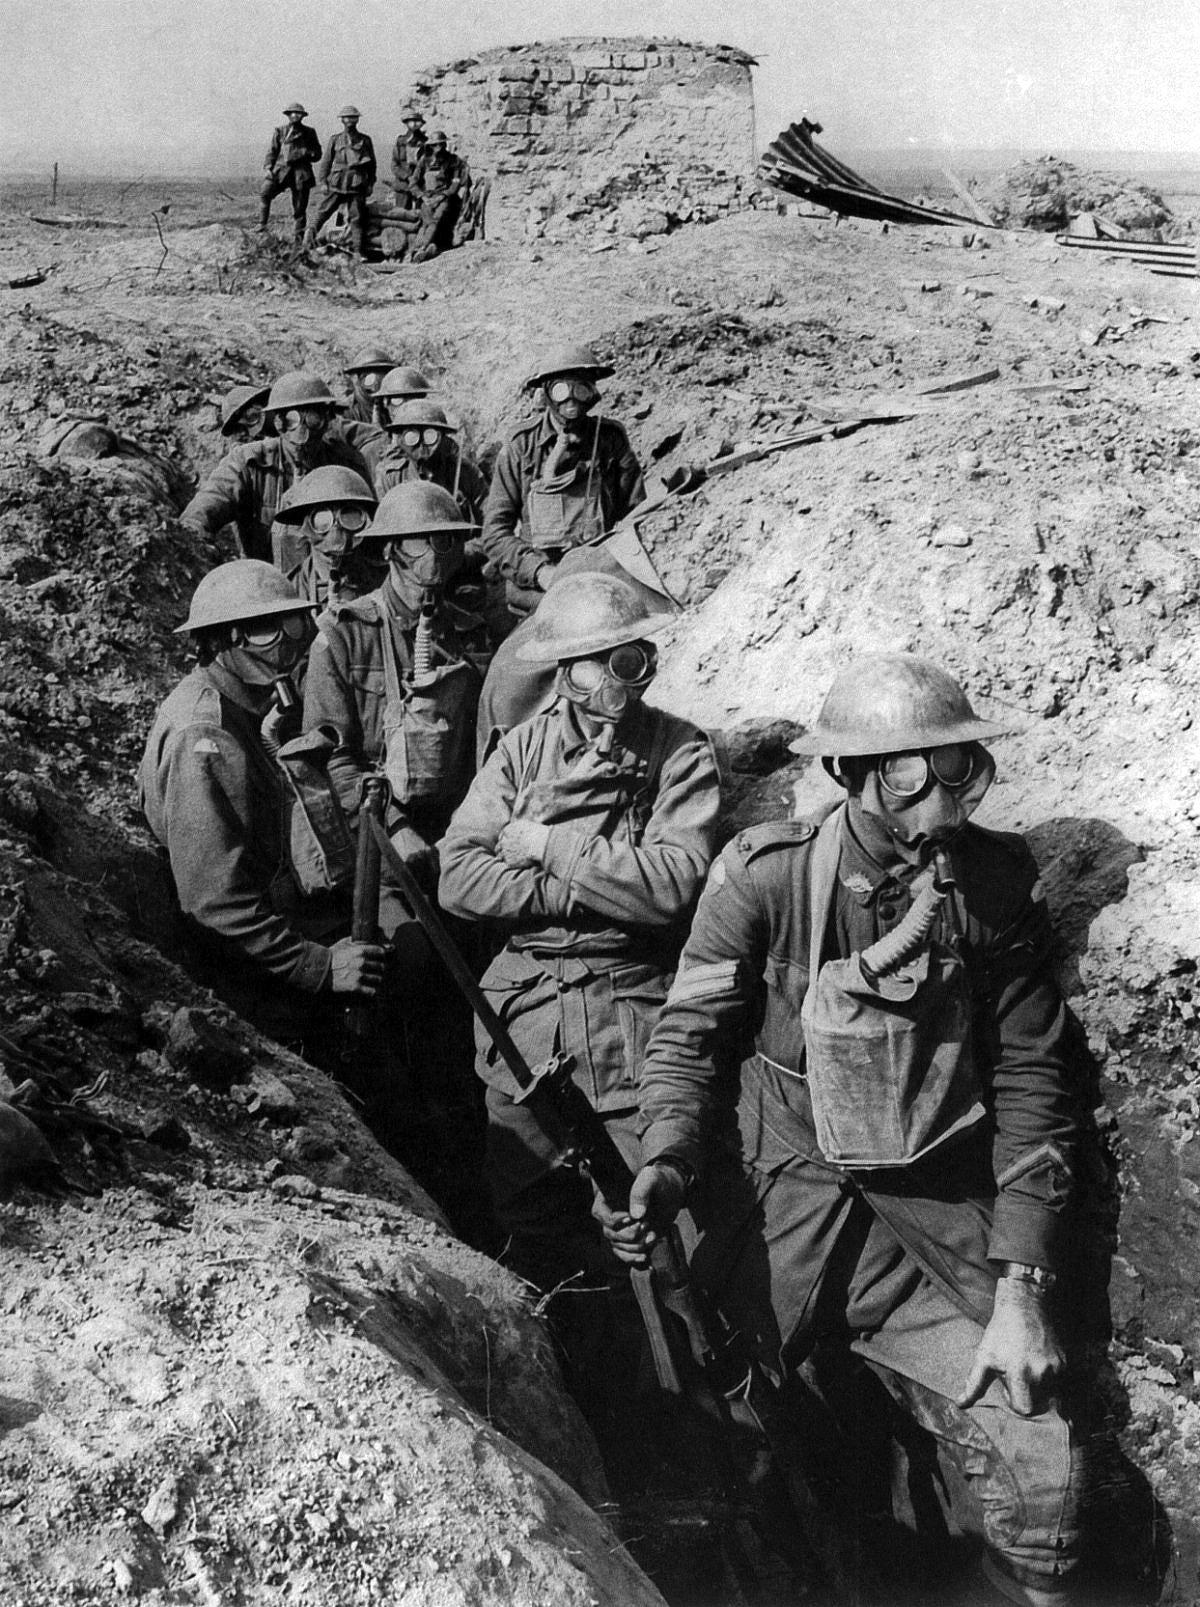 Australian_infantry_small_box_respirators_Ypres_1917